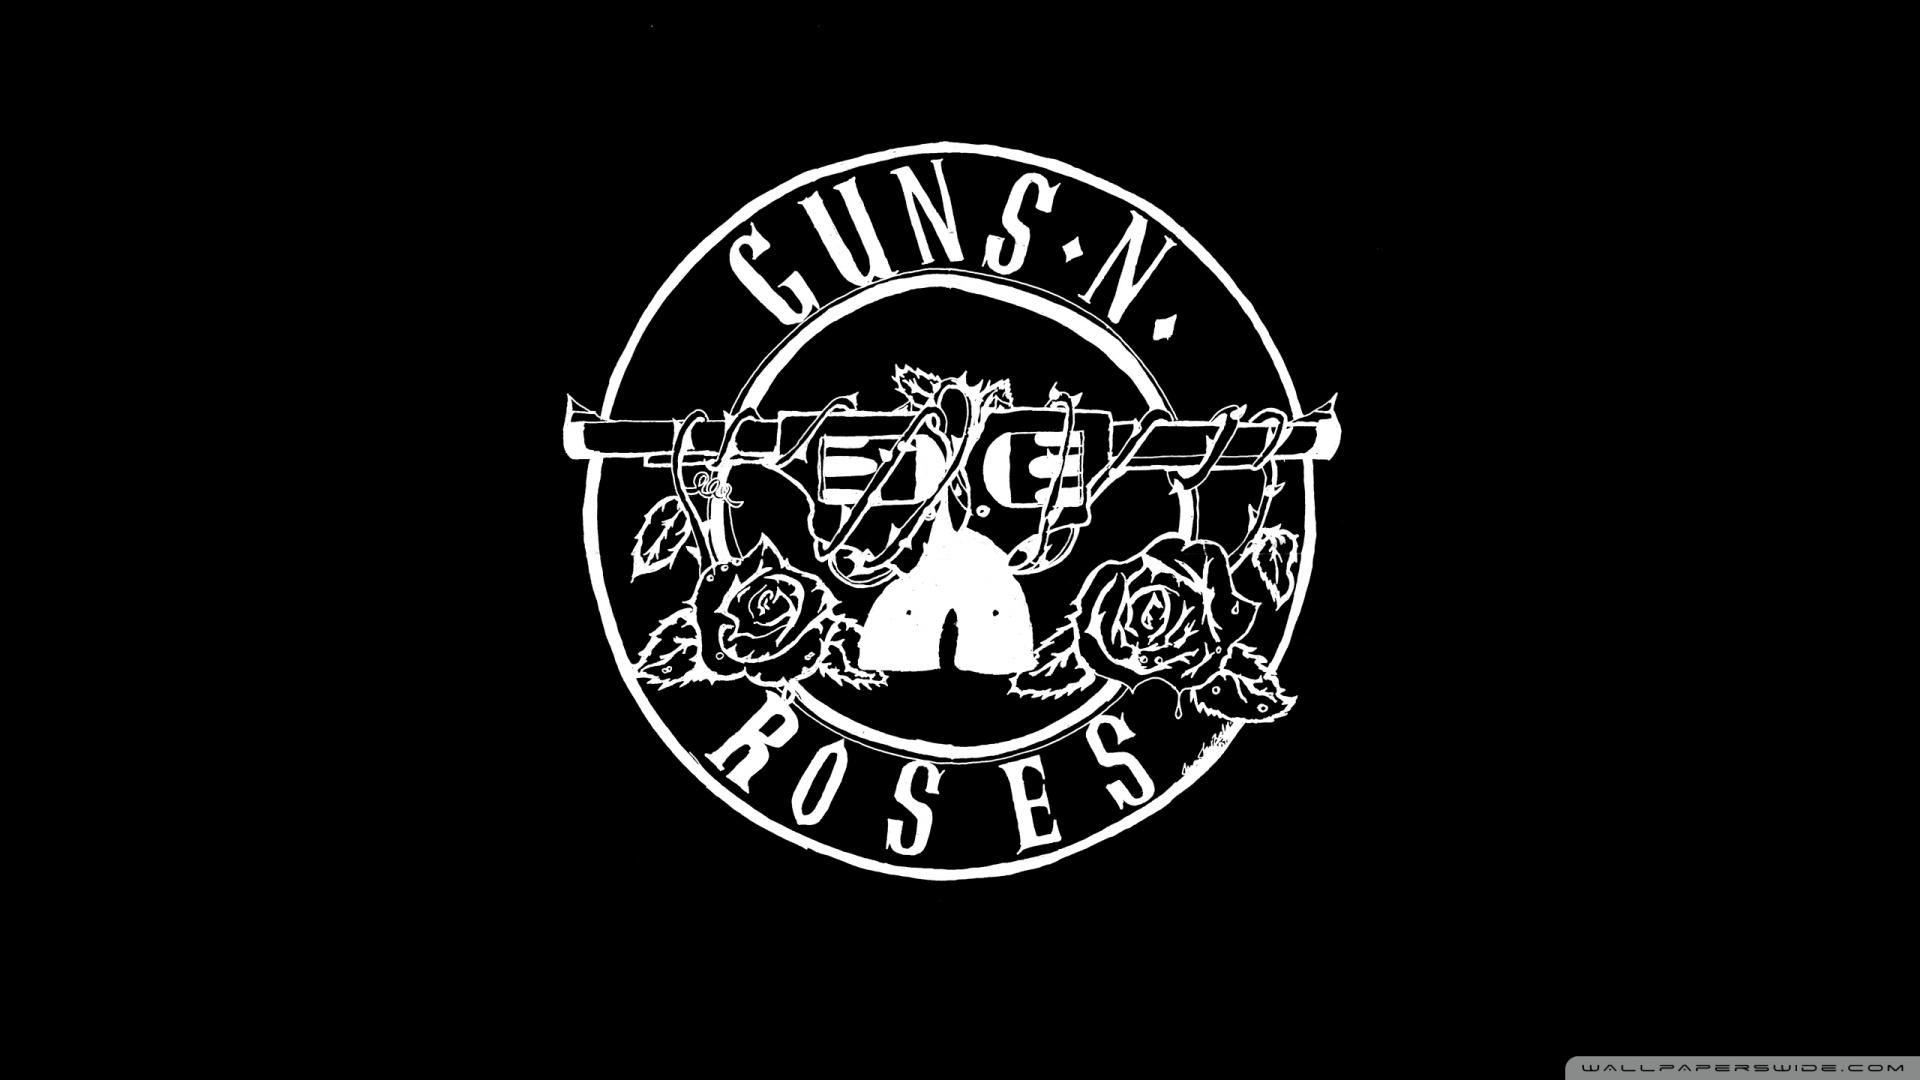 Guns N Roses Logo Hd 3 Wallpaper 1920x1080 Guns N Roses Logo Hd 3 1920x1080